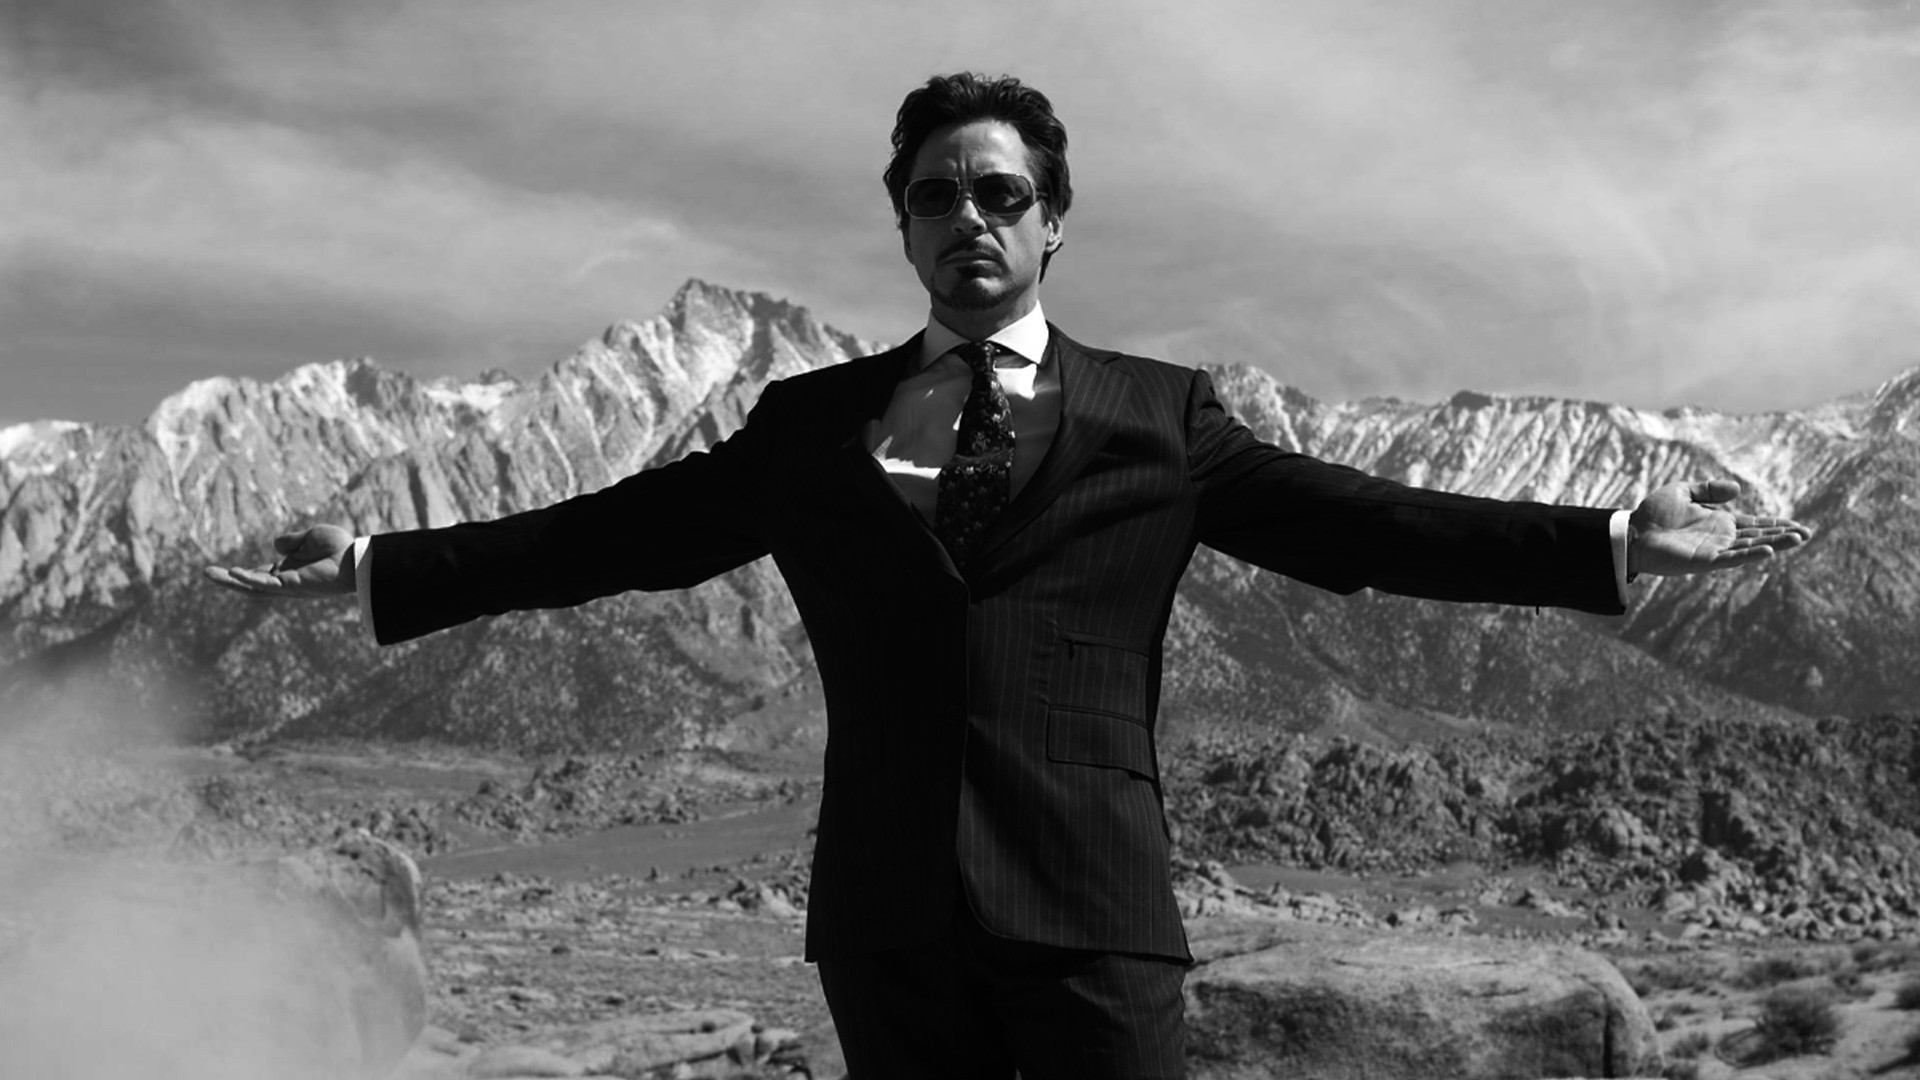 Robert Downey Jr Iron Man Wallpaper 71 images 1920x1080